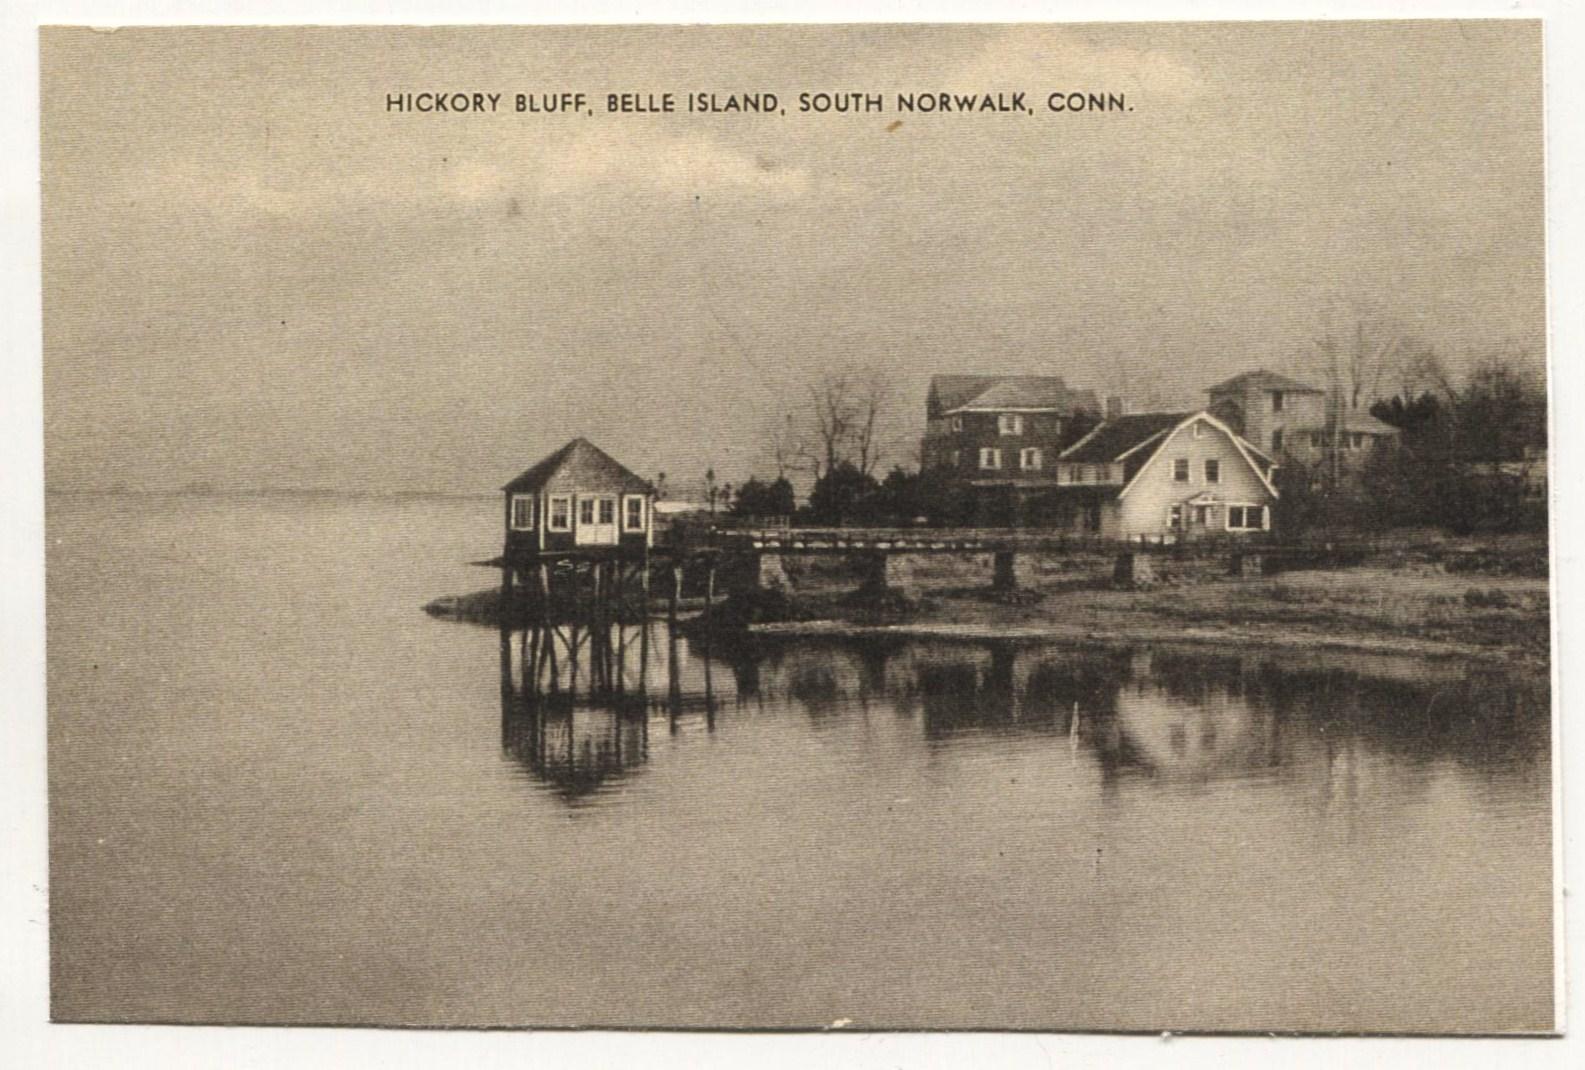 #2 Sartor. Boathouse before 1950 001